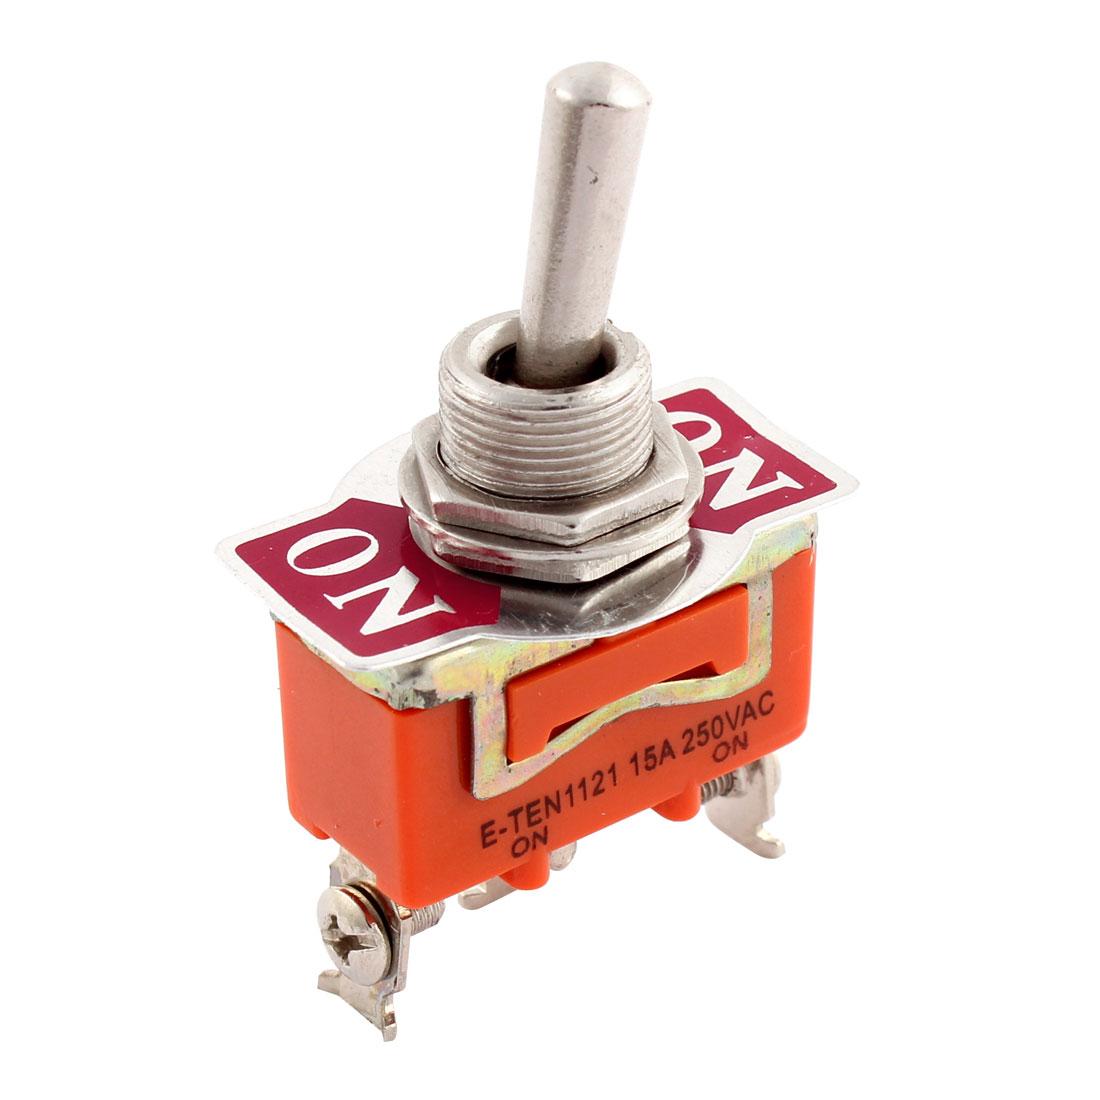 E-TEN1121 15A 250V AC 3-Pin SPDT ON-ON Mini Toggle Switche Orange Silver Tone